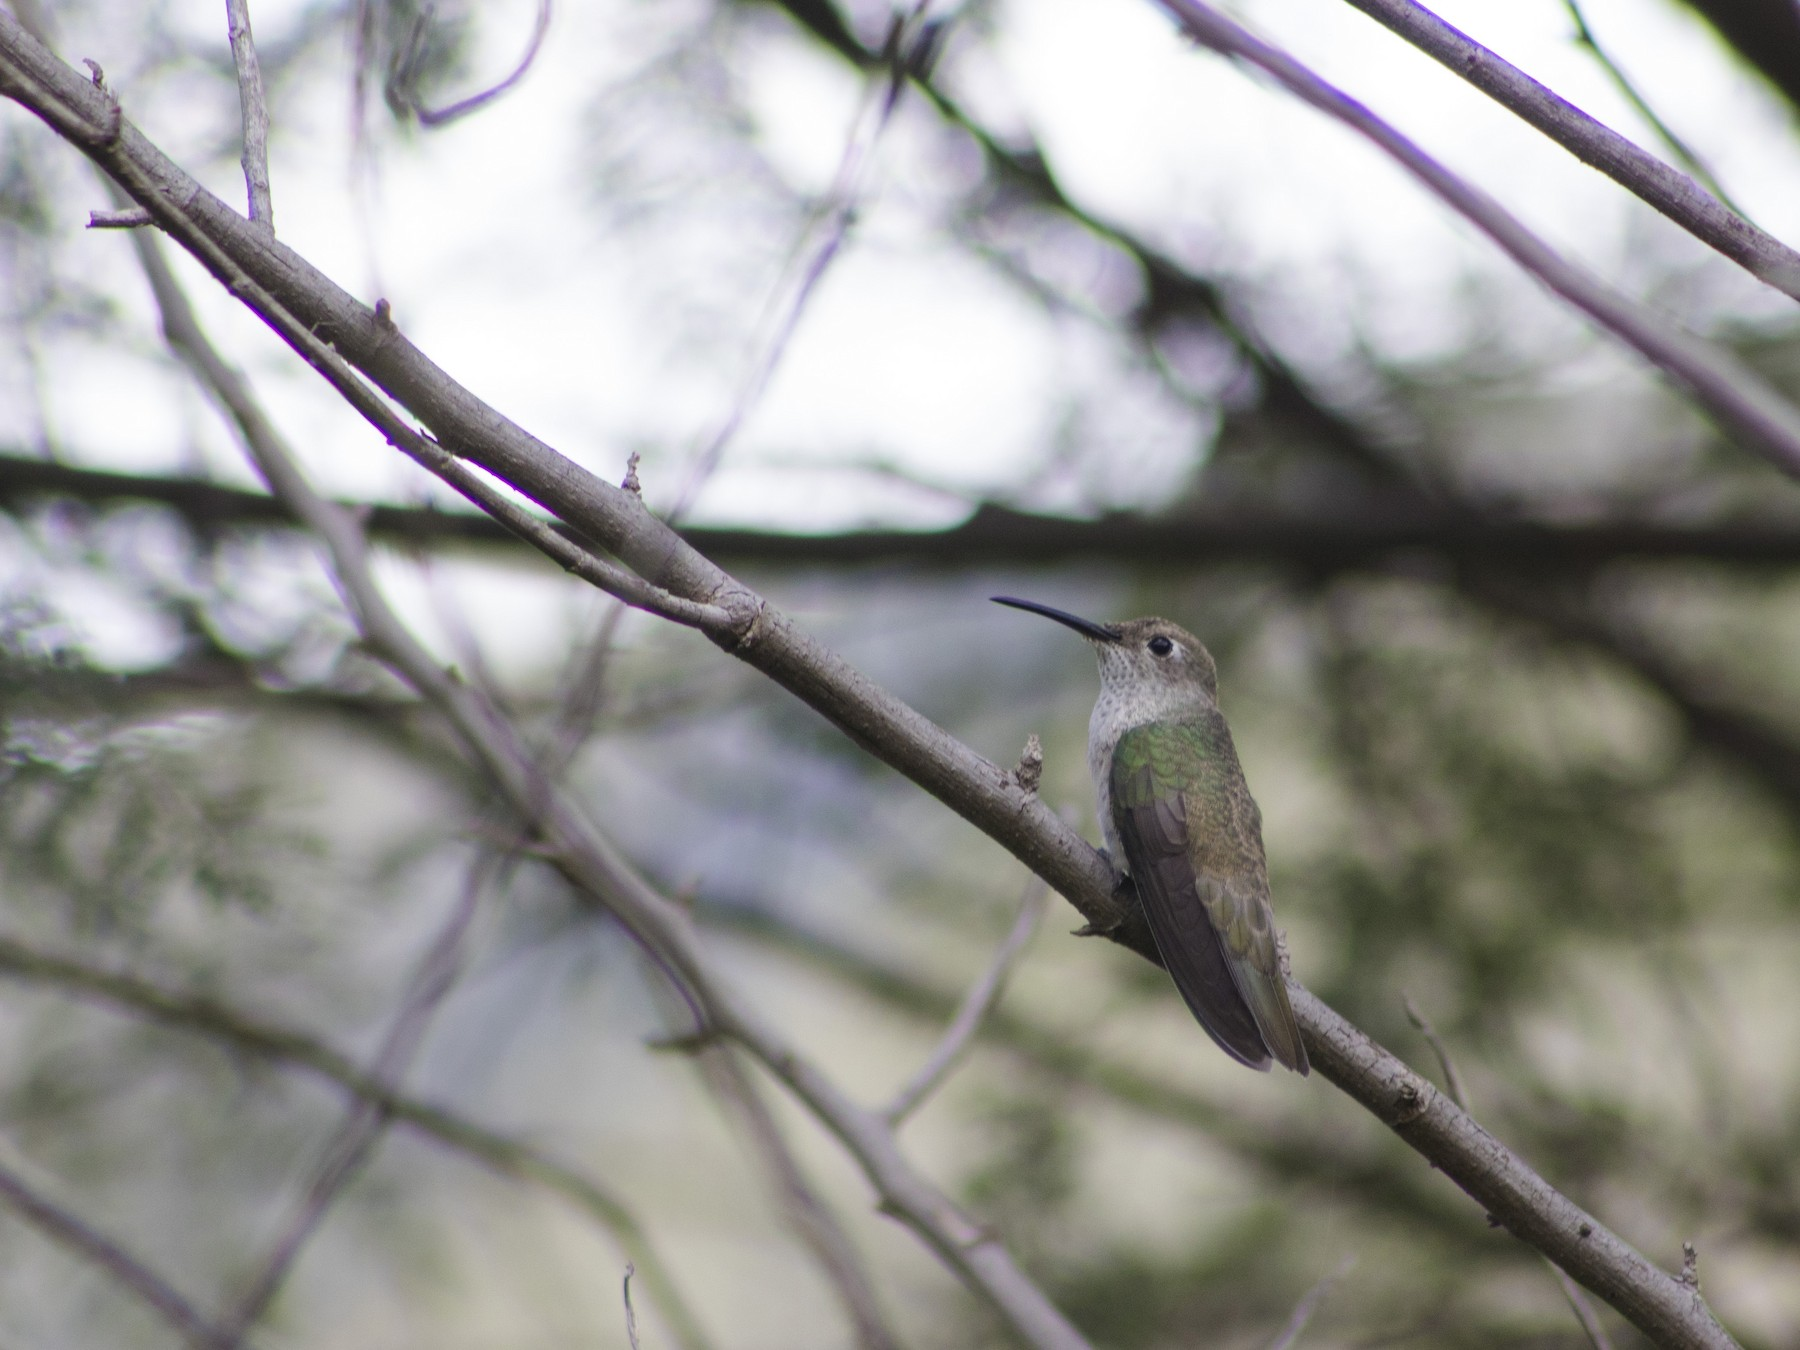 Spot-throated Hummingbird - Wilmer Lozano medina